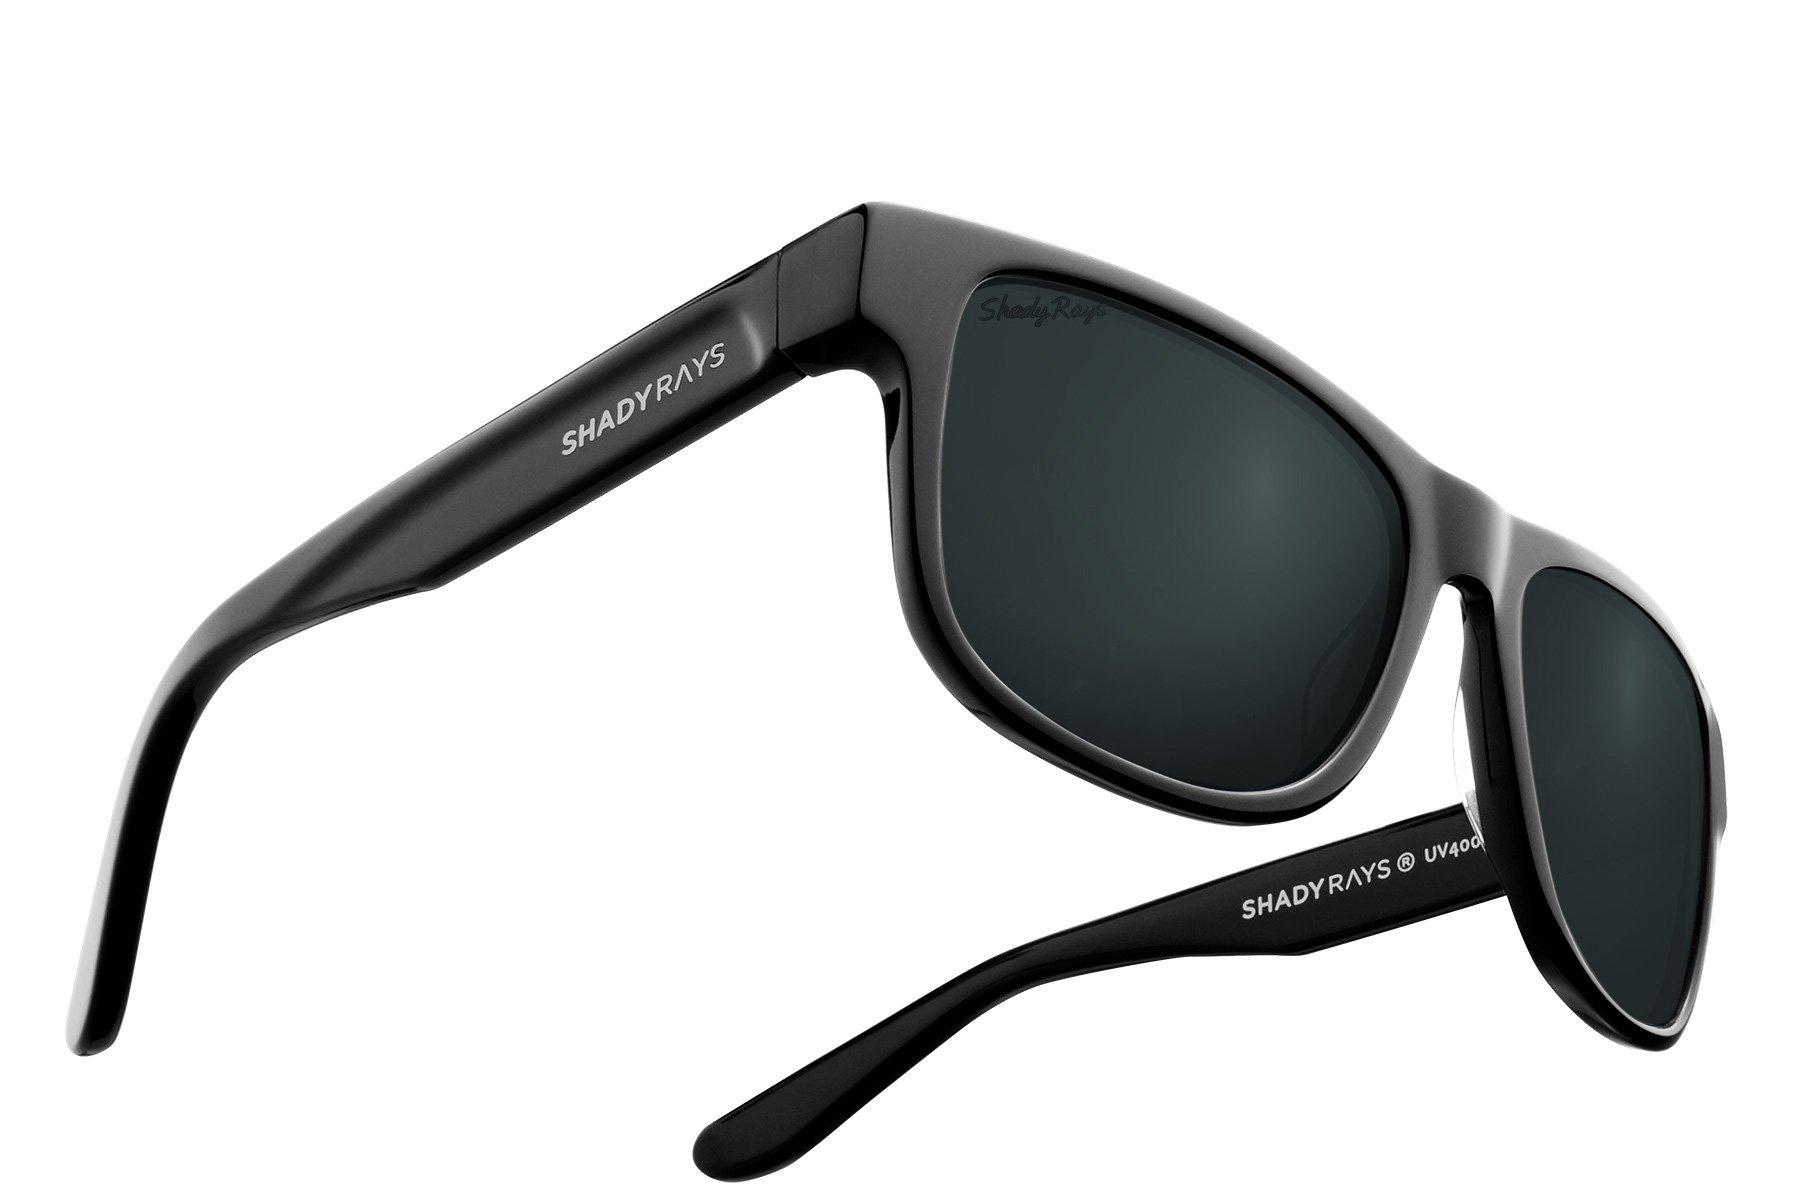 Shady Rays Sunglasses Ventura Limited, Polarized, Blackout